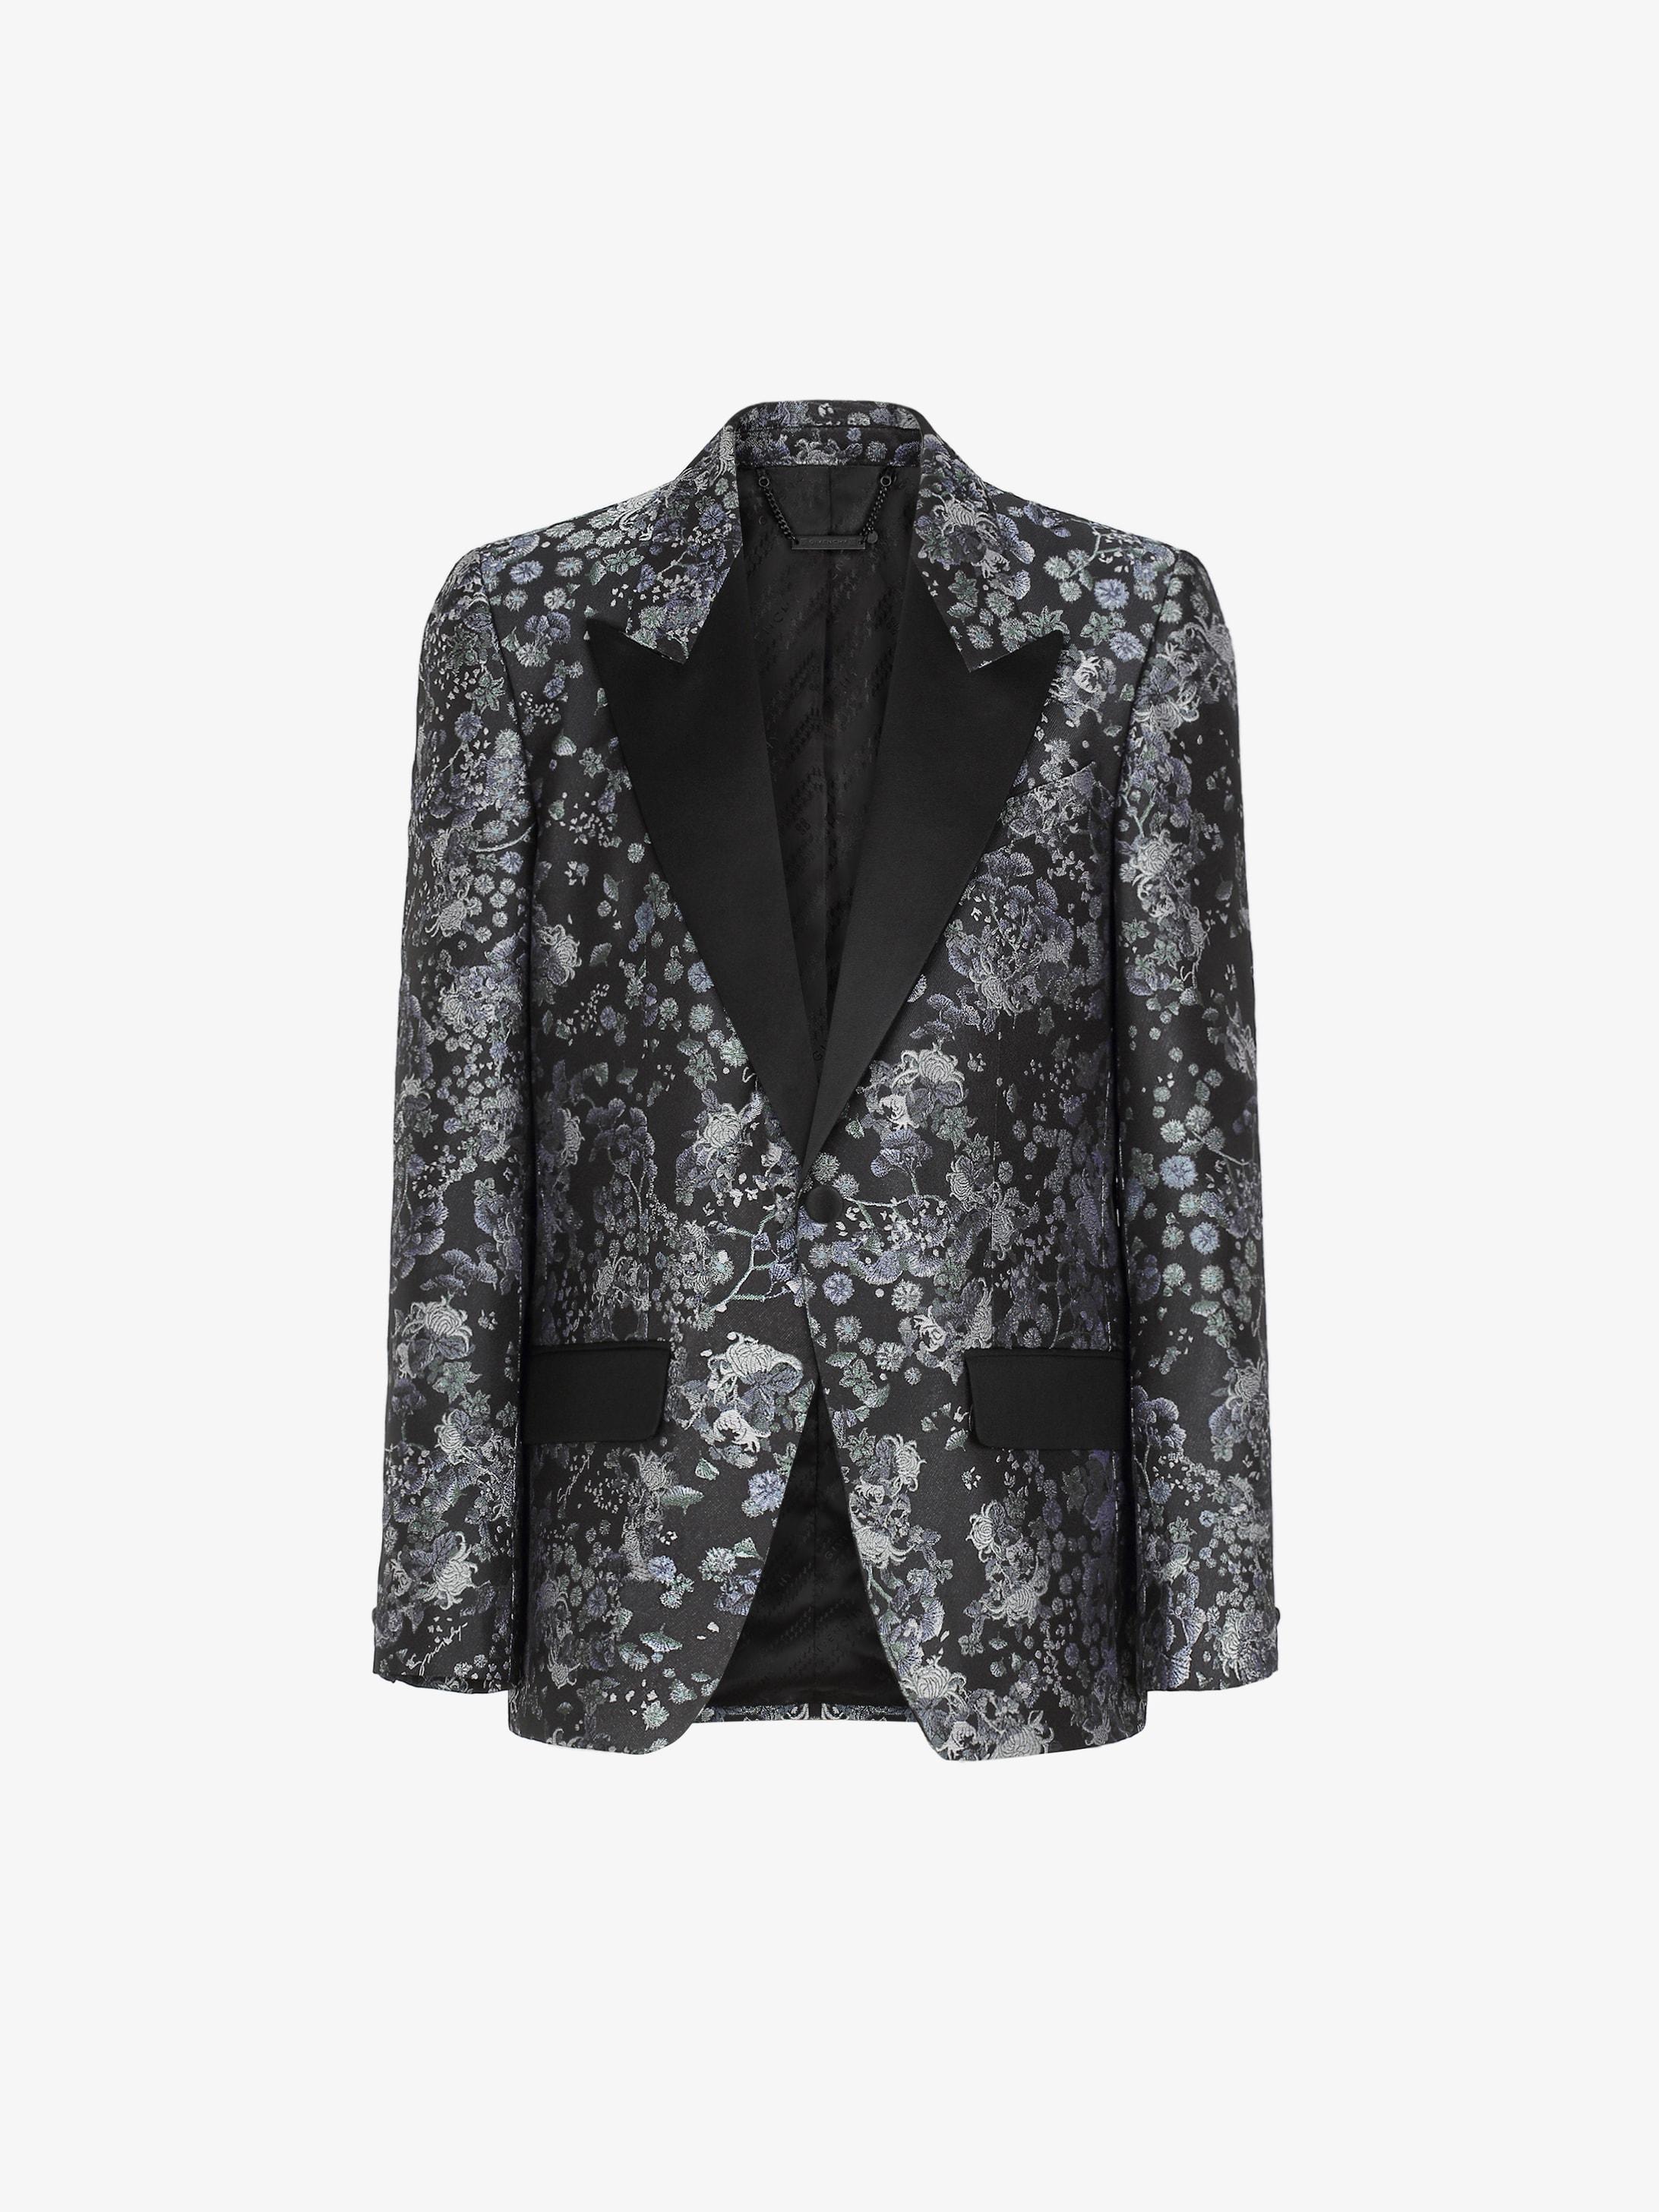 Tuxedo jacket in floral silk jacquard